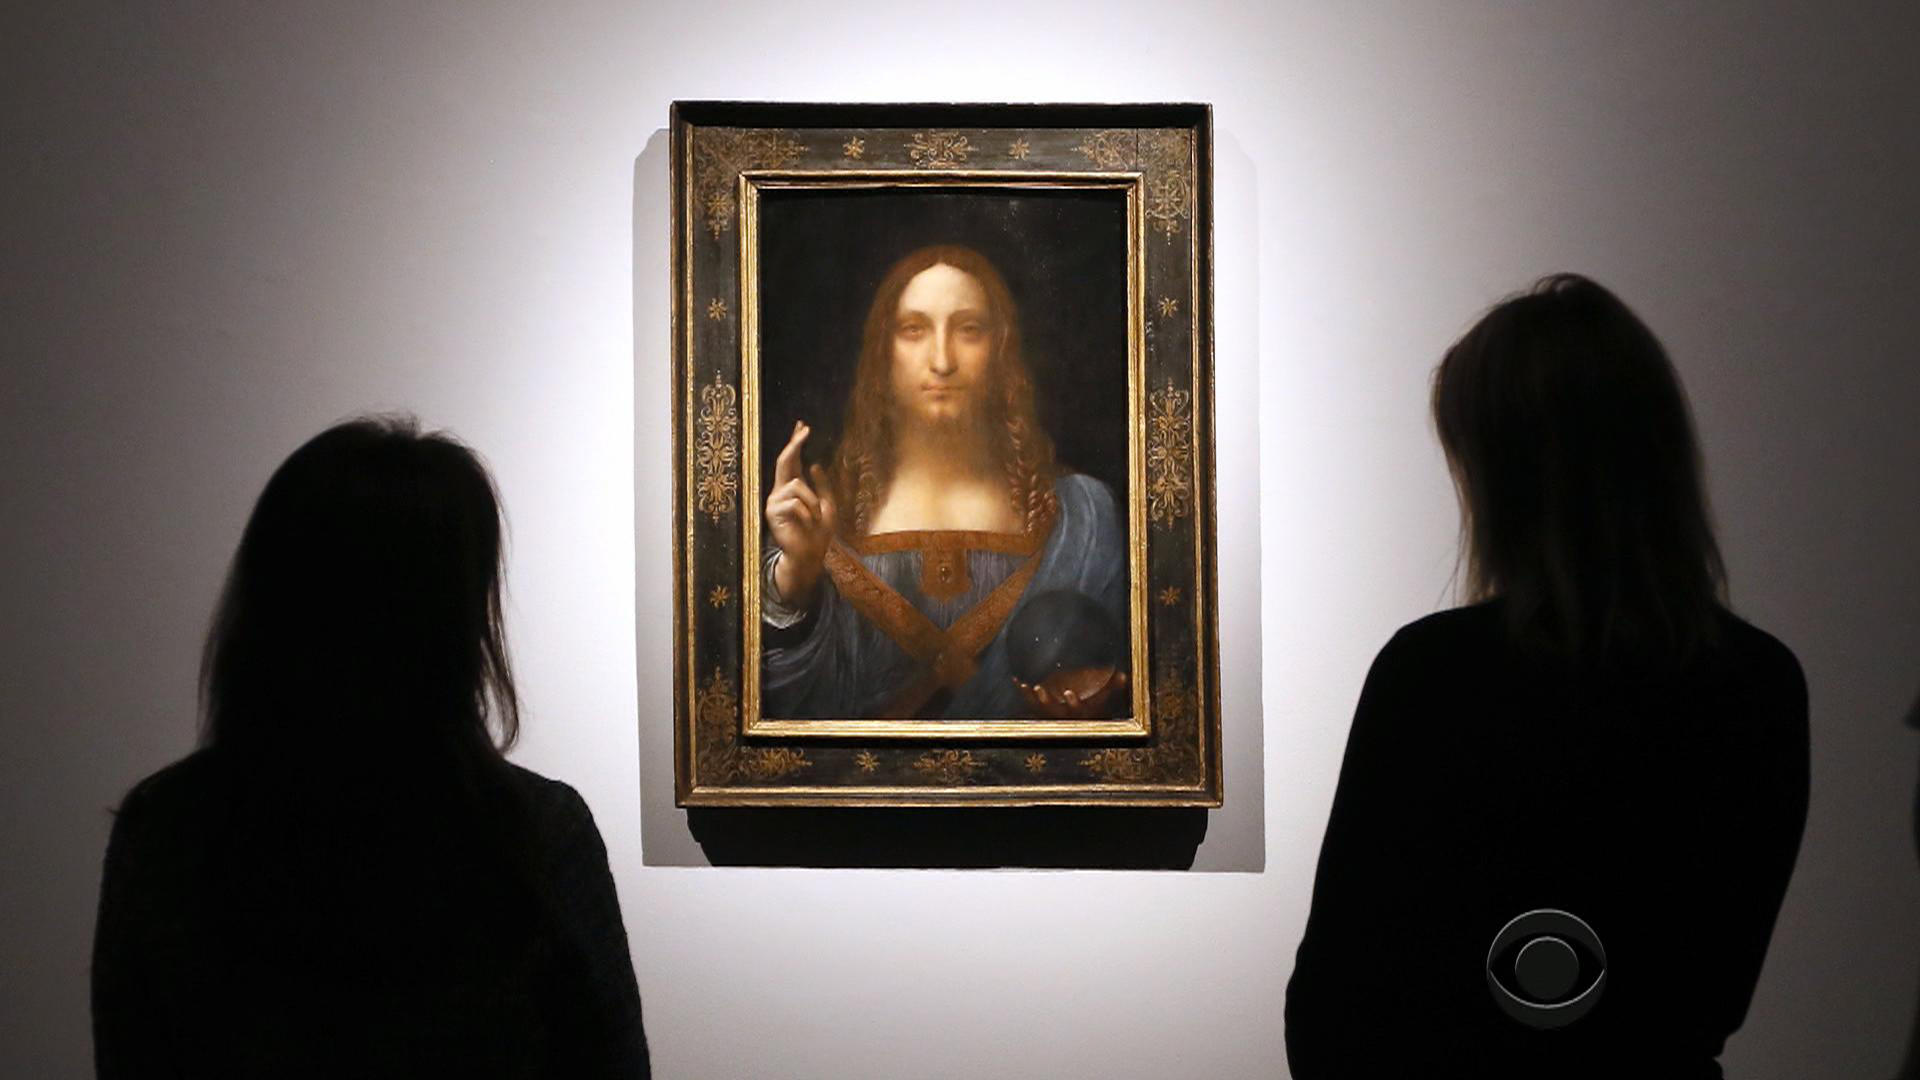 leonardo da vinci painting salvator mundi sells for  450m